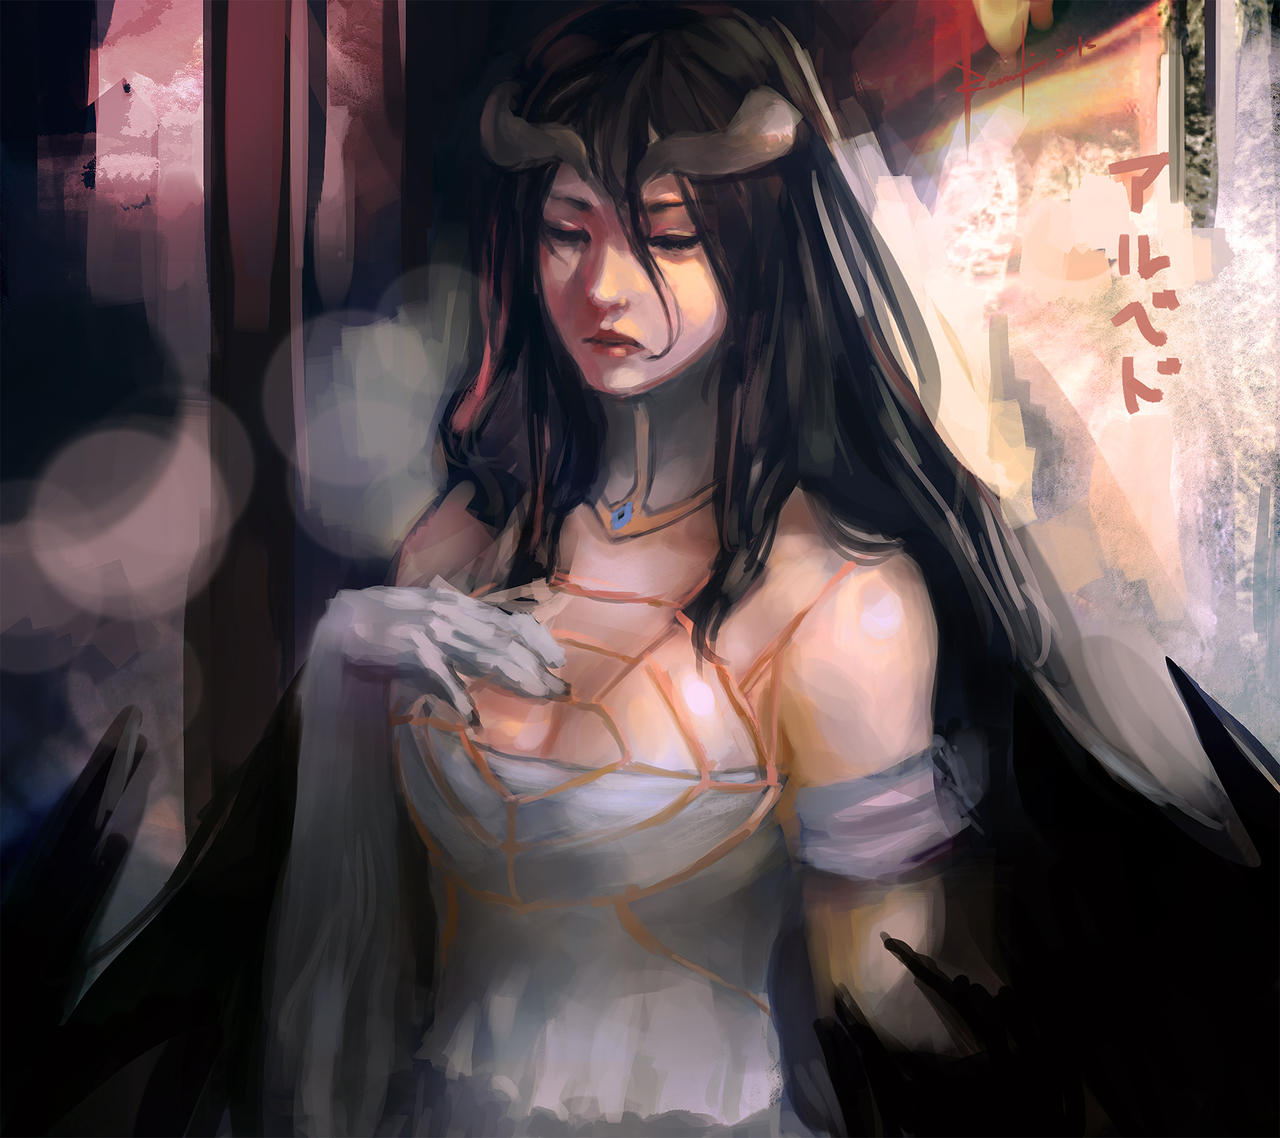 albedo_by_wesleychen-d9c27ay.jpg